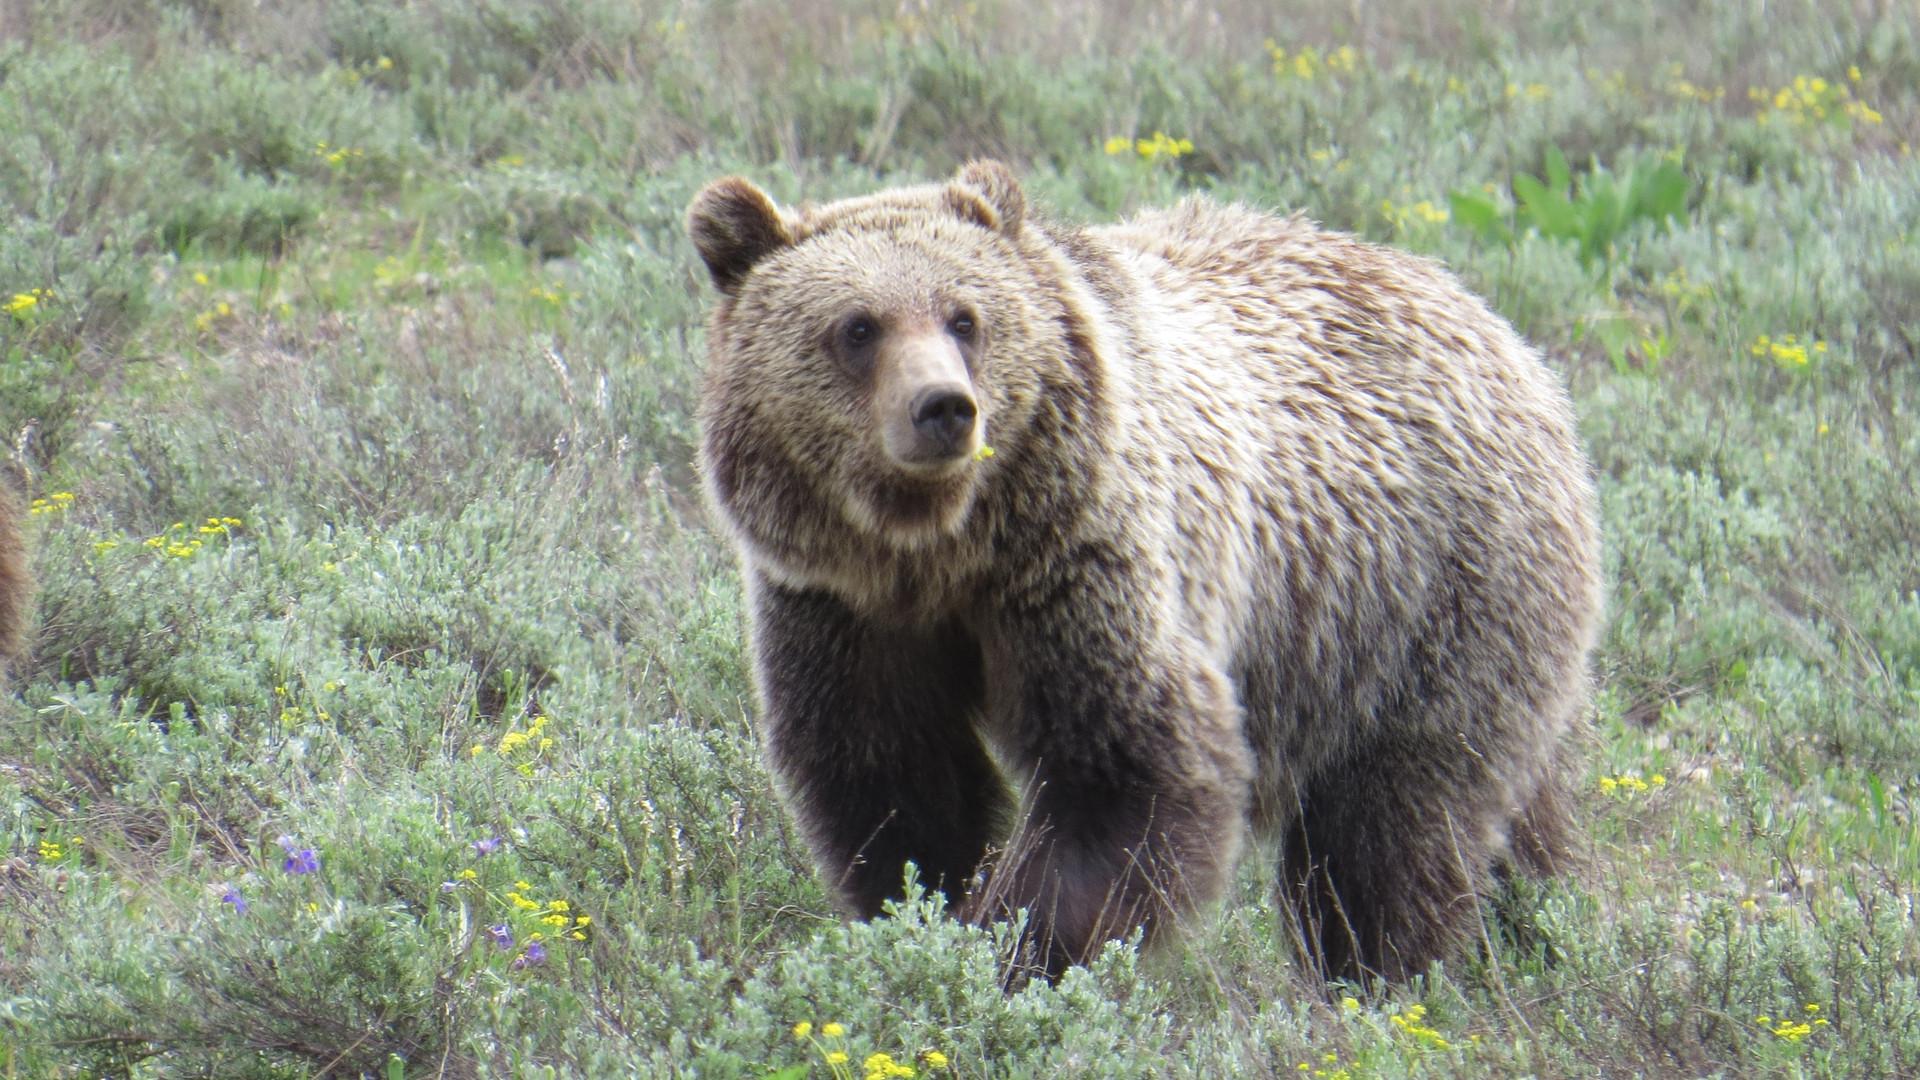 grand-teton-national-park-tour-bear-399-